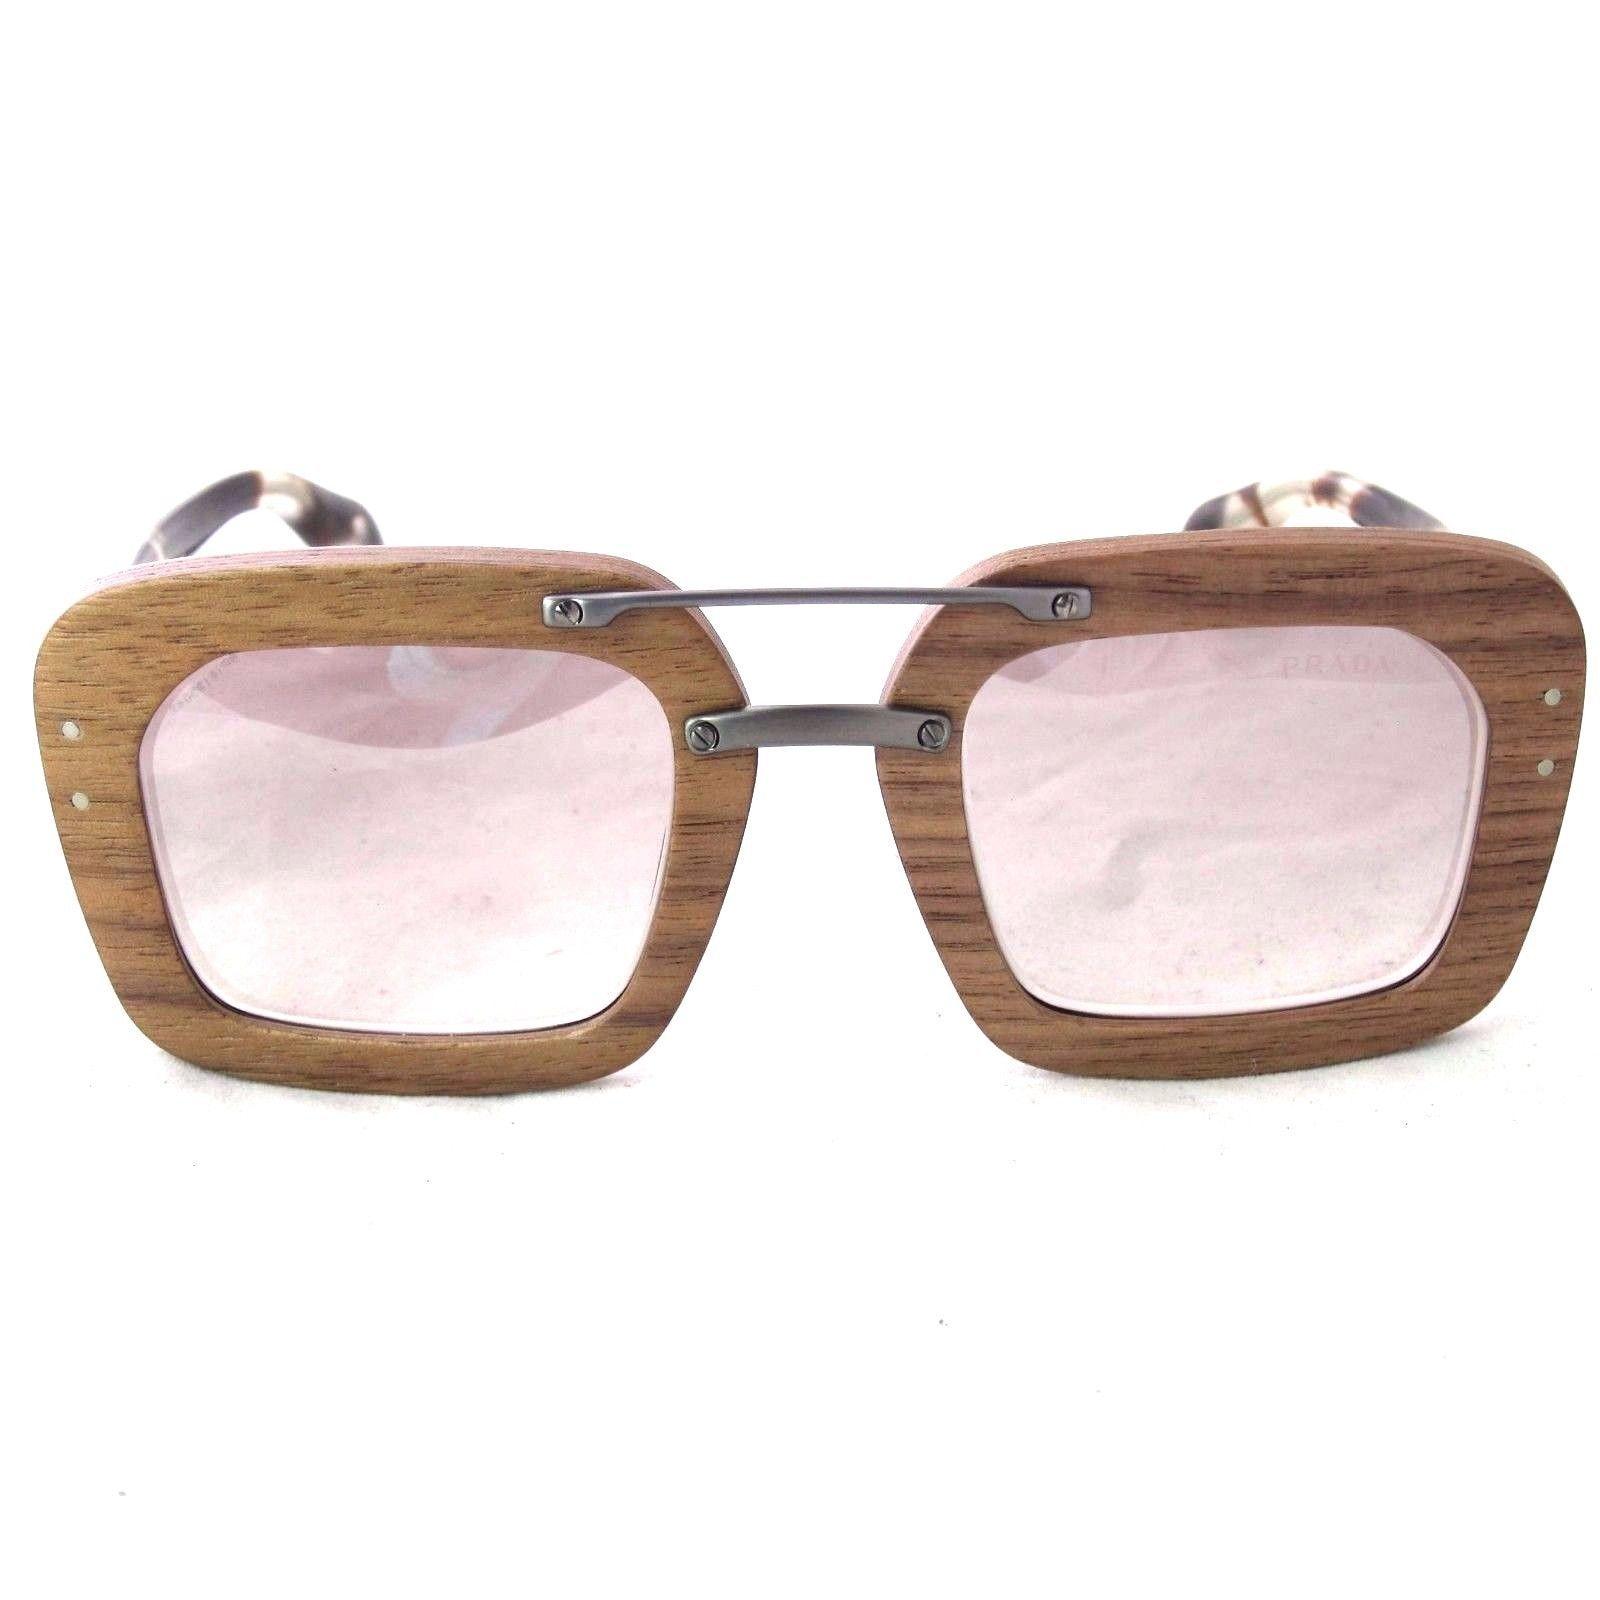 35 New Wood Items Prada Brown Kk Similar Pd13135 Authentic And 4L3ASc5Rjq